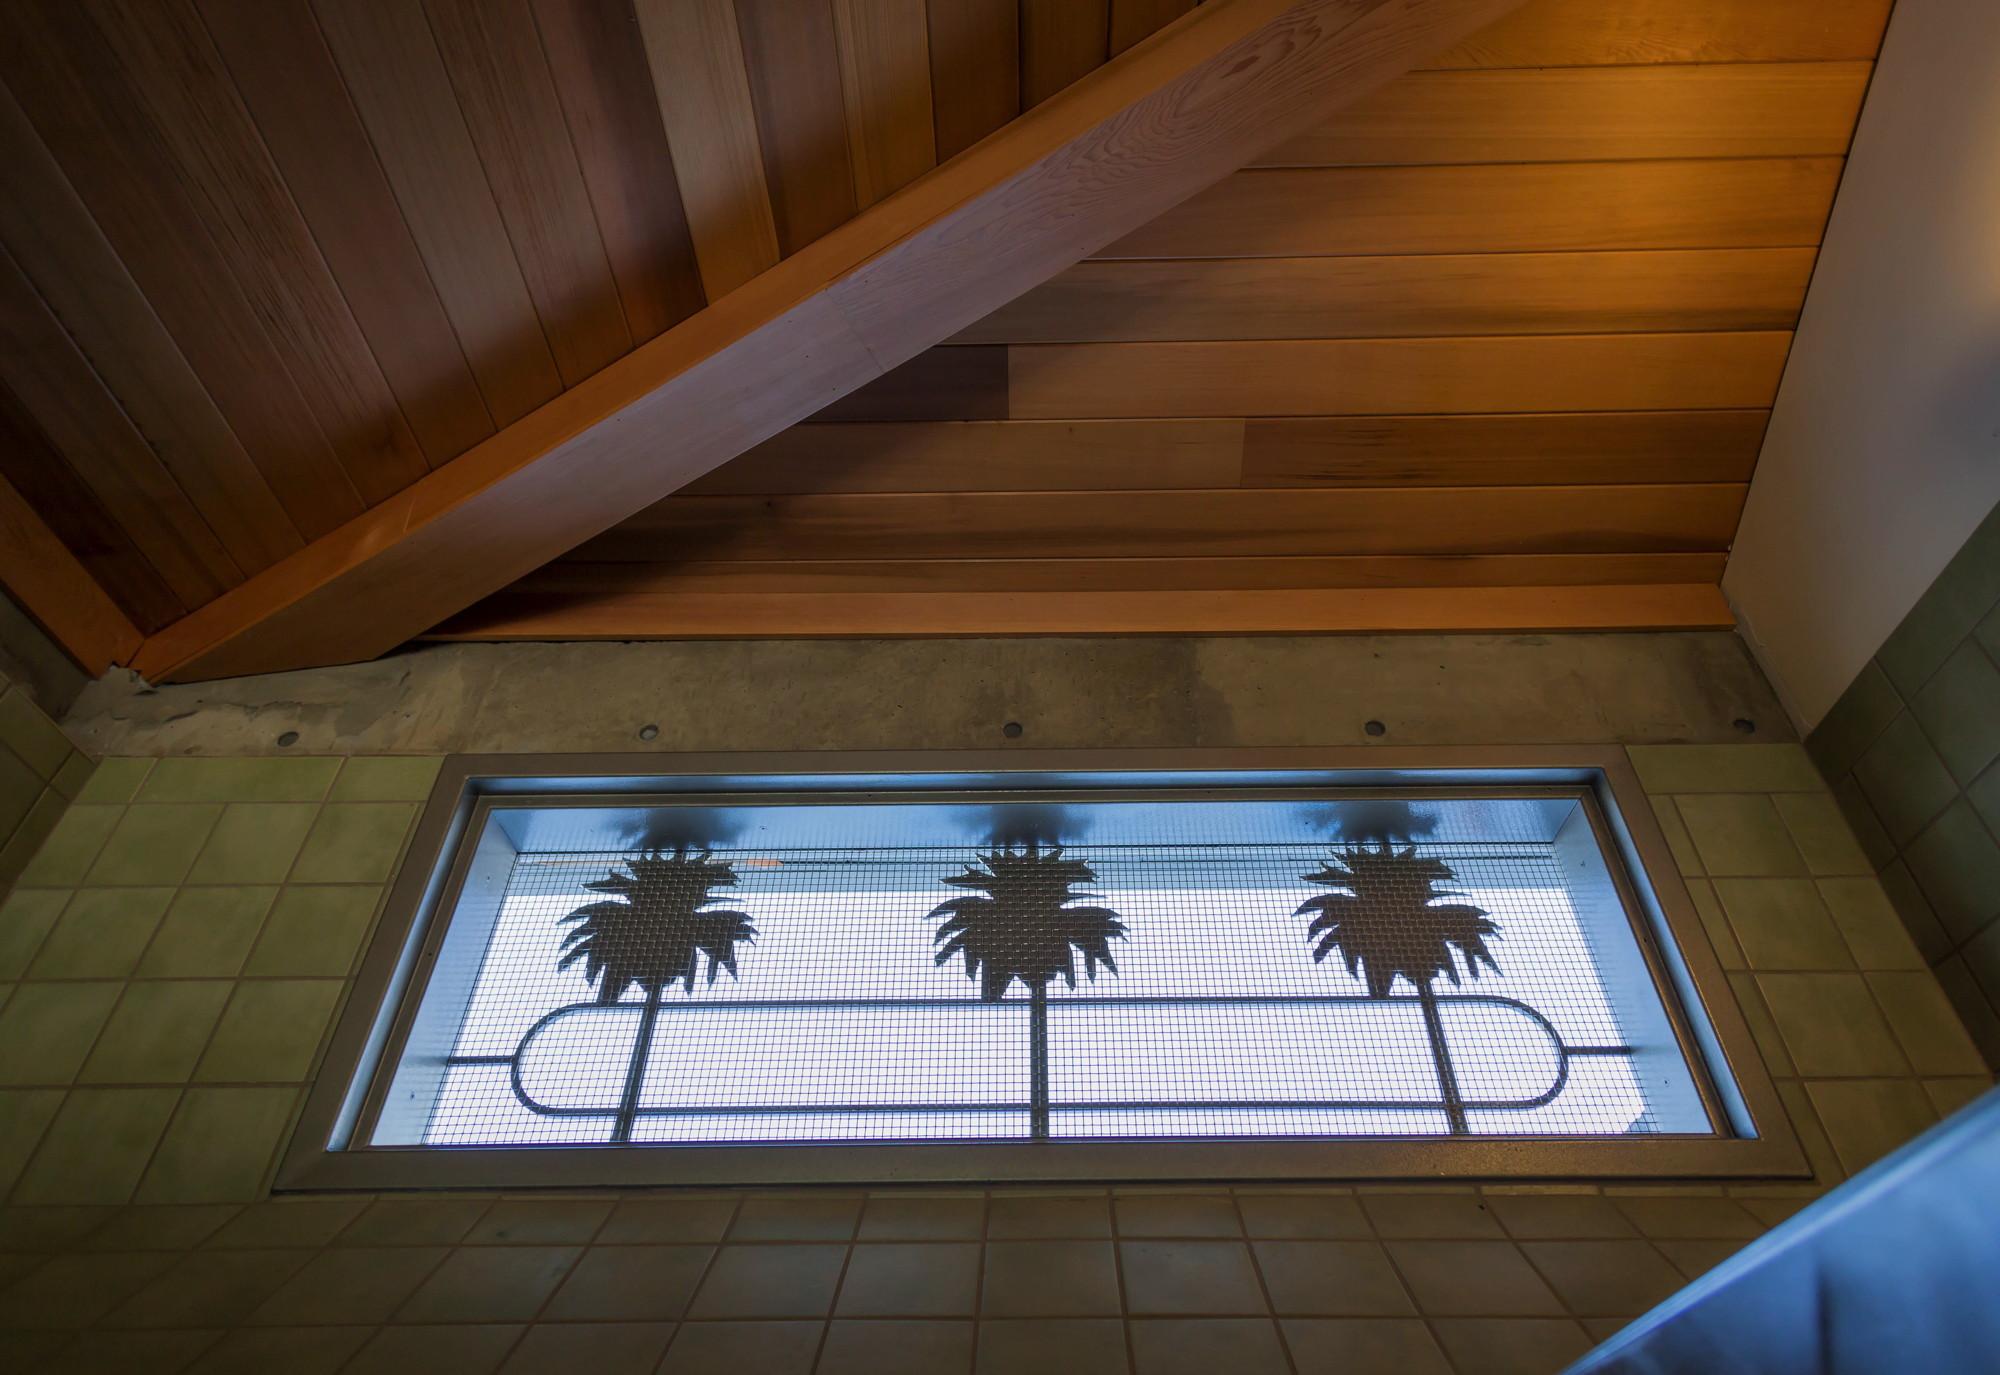 Palm tree motif